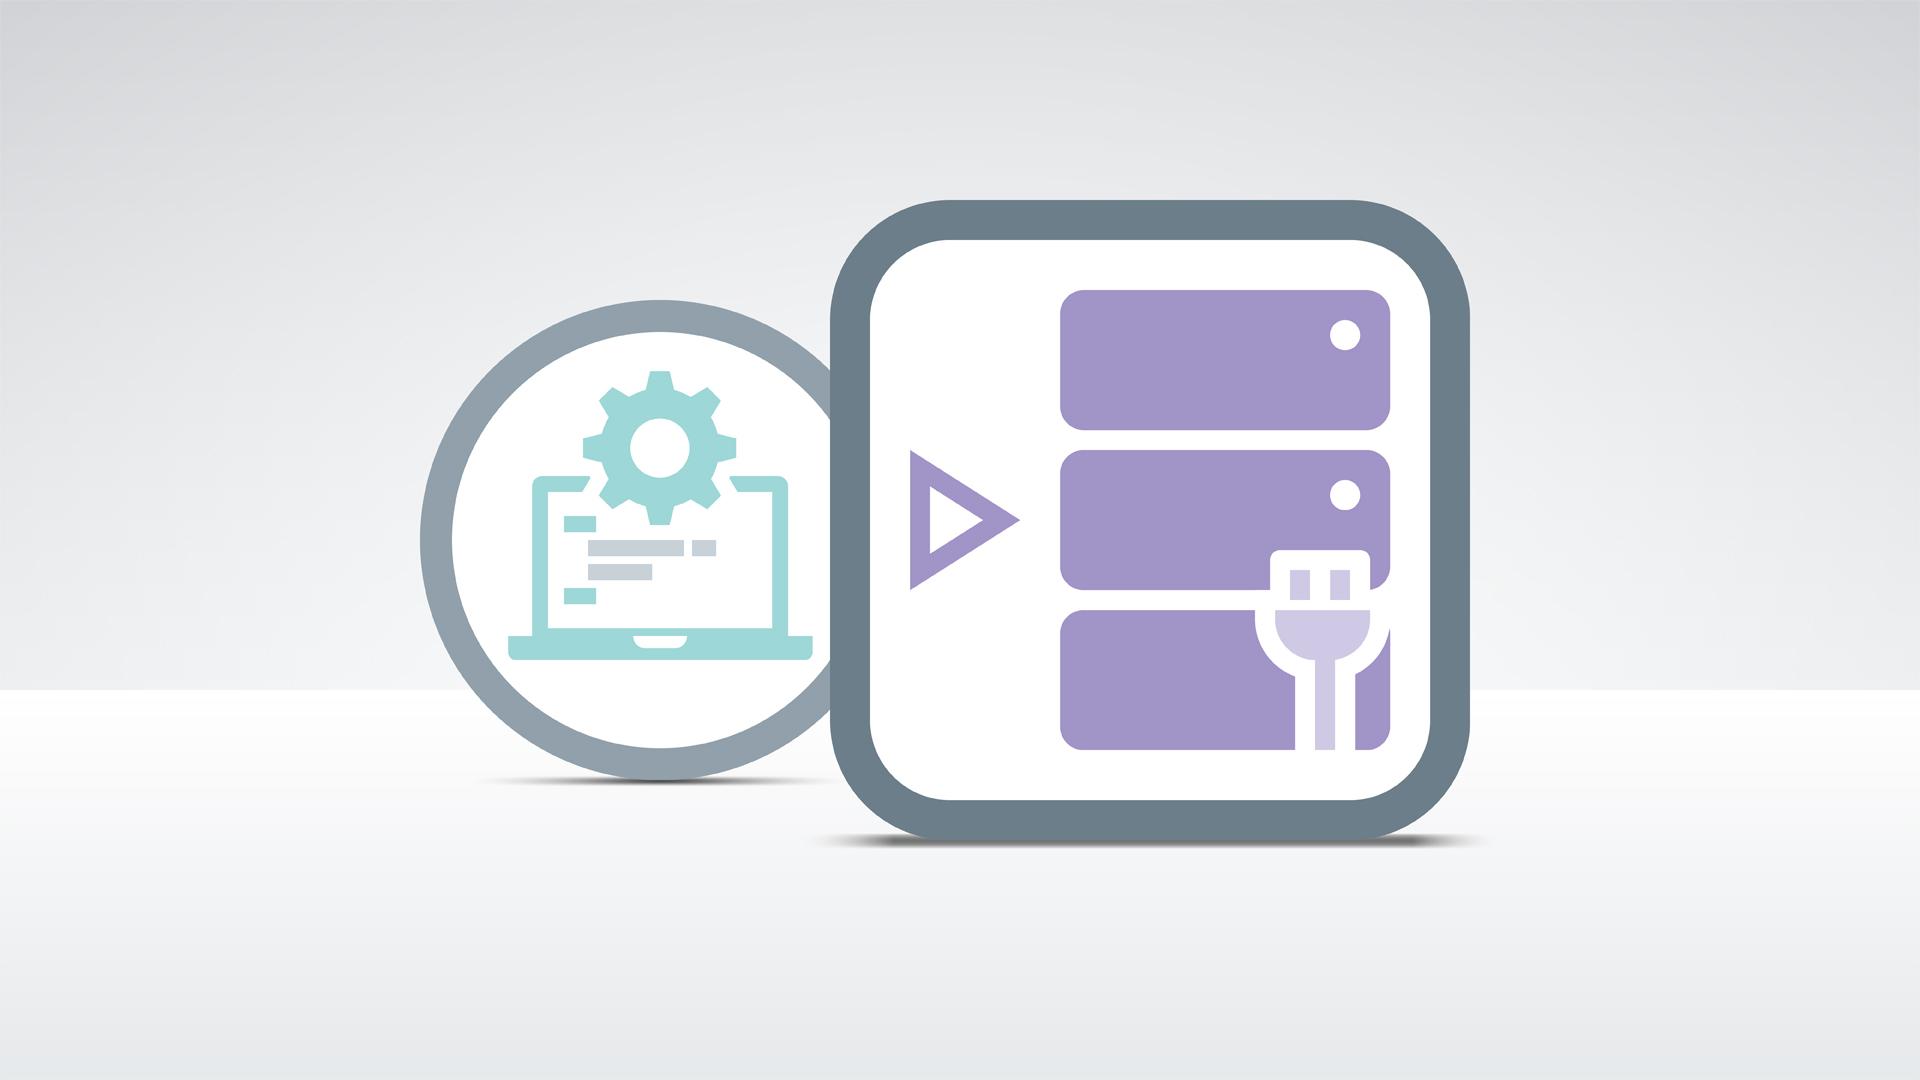 visual studio 2015 datagridview tutorial